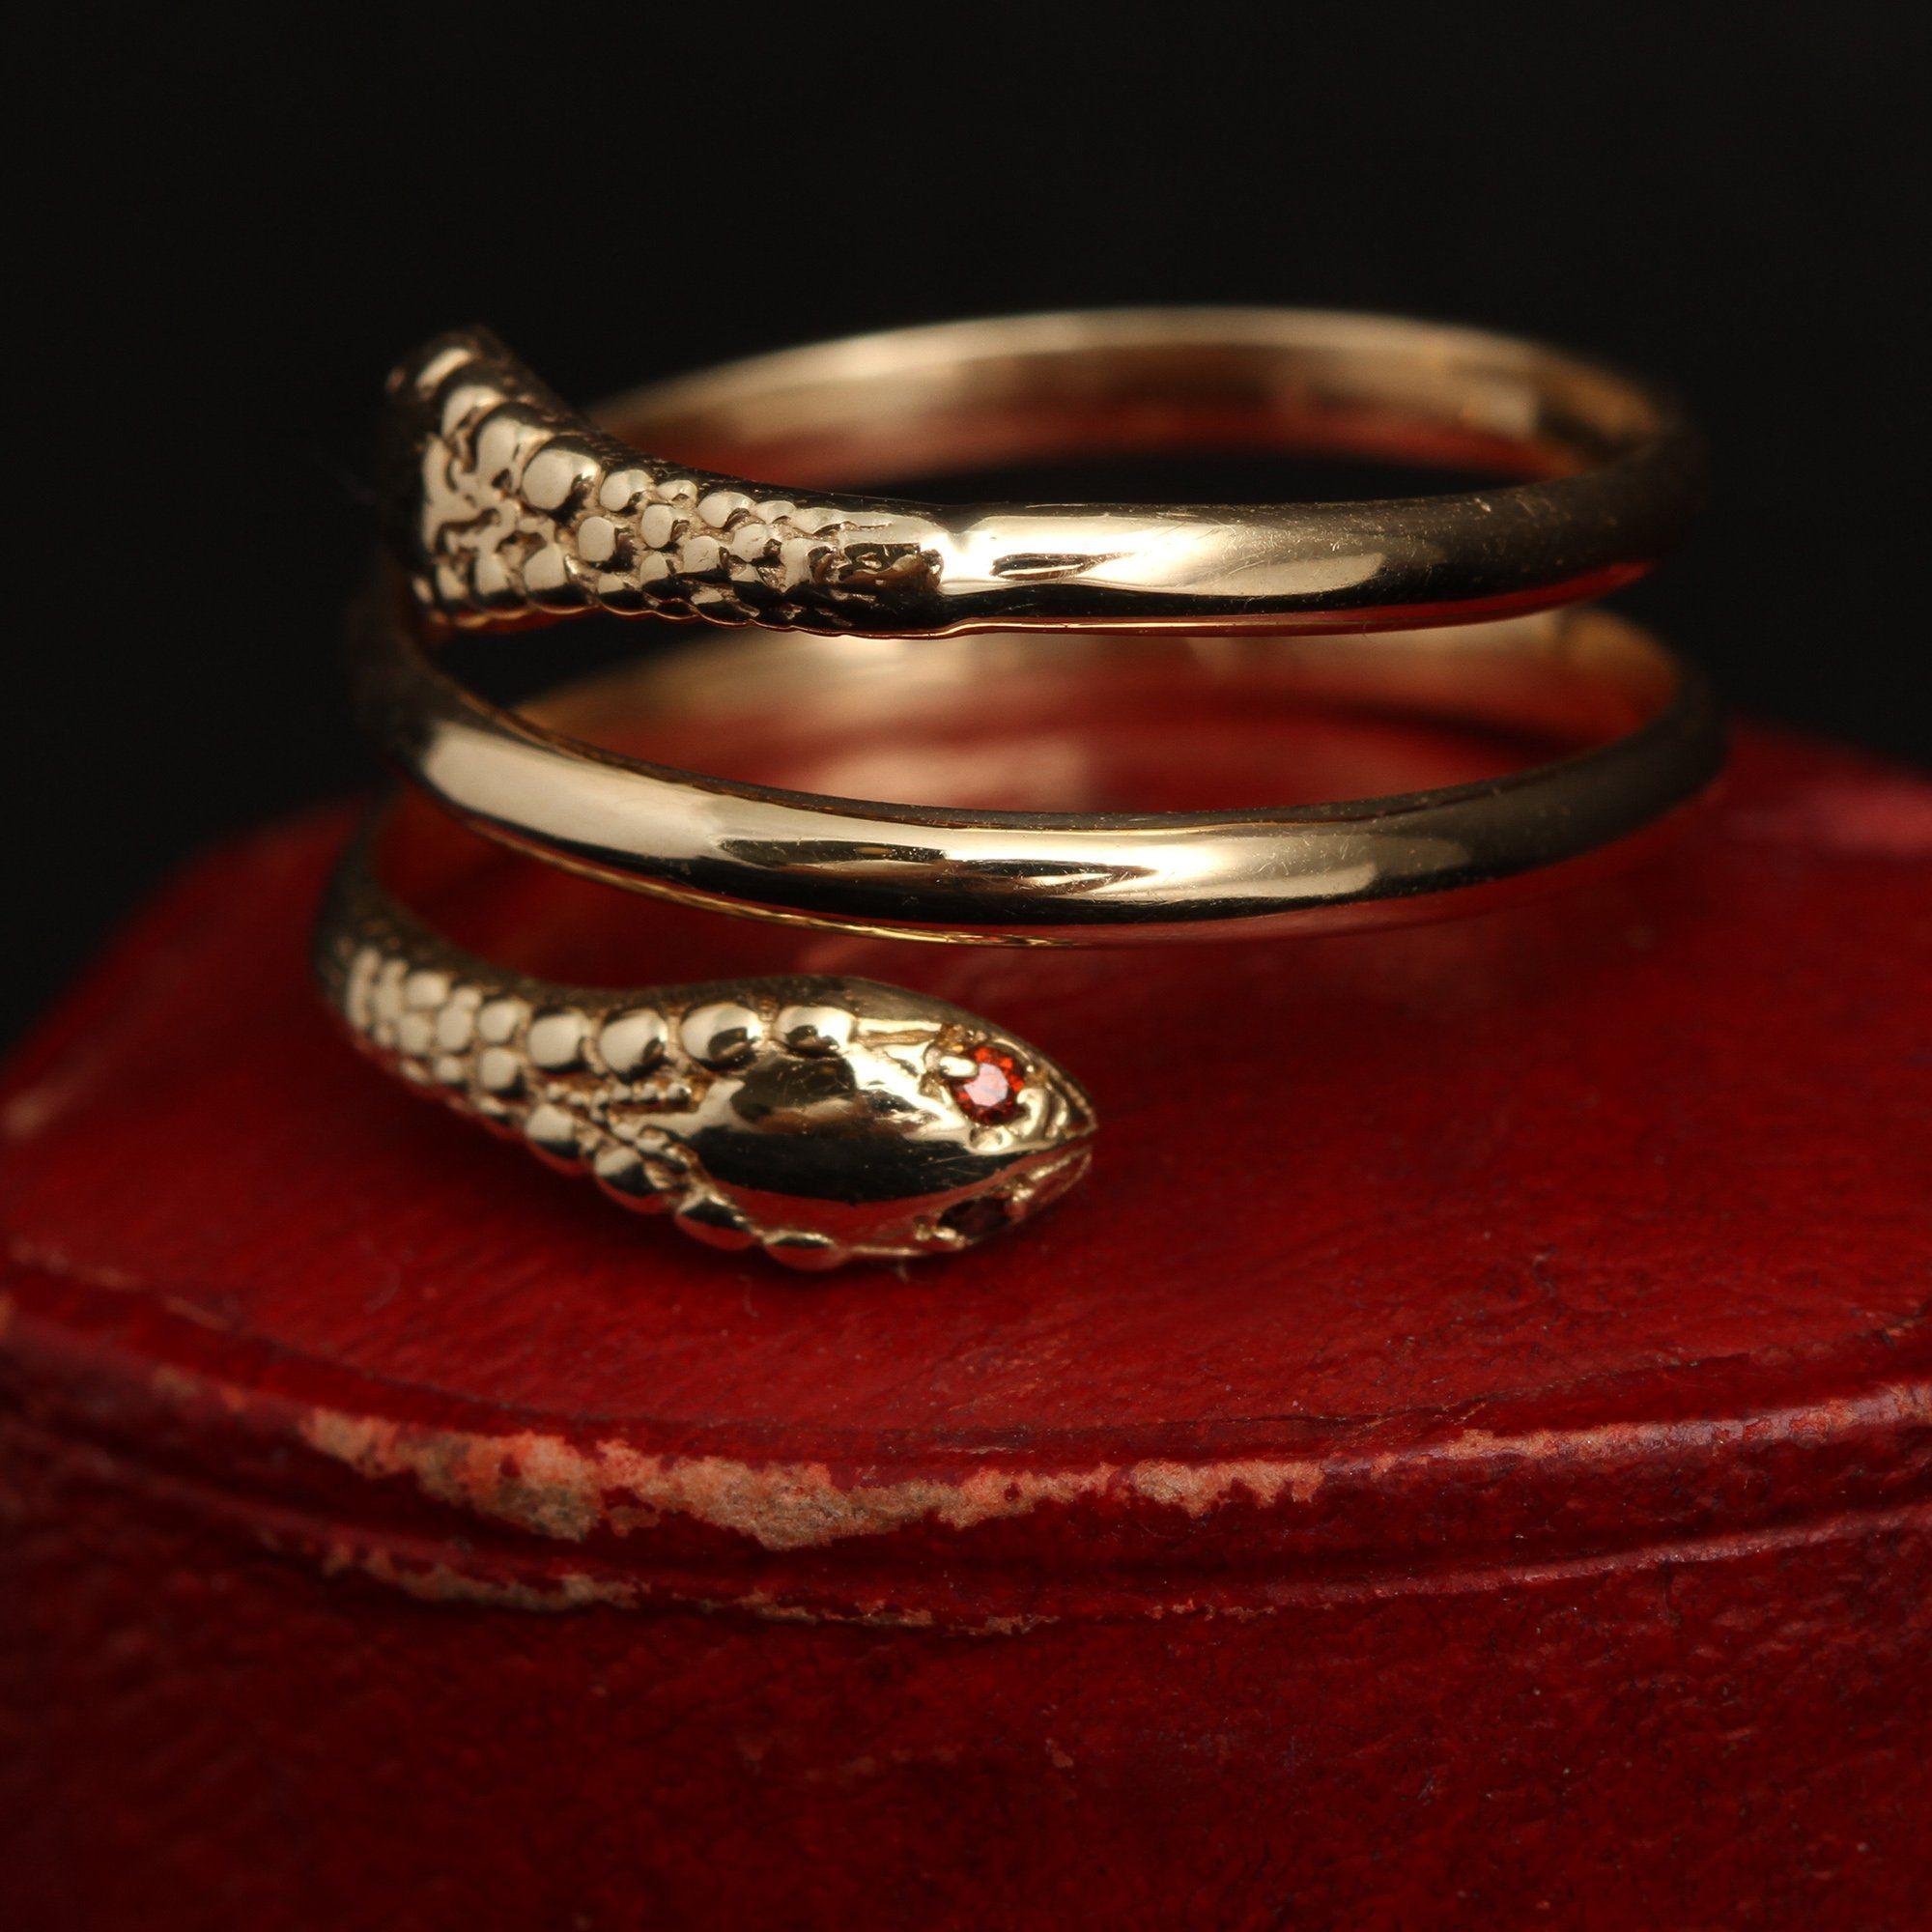 Two-Headed Snake Ring